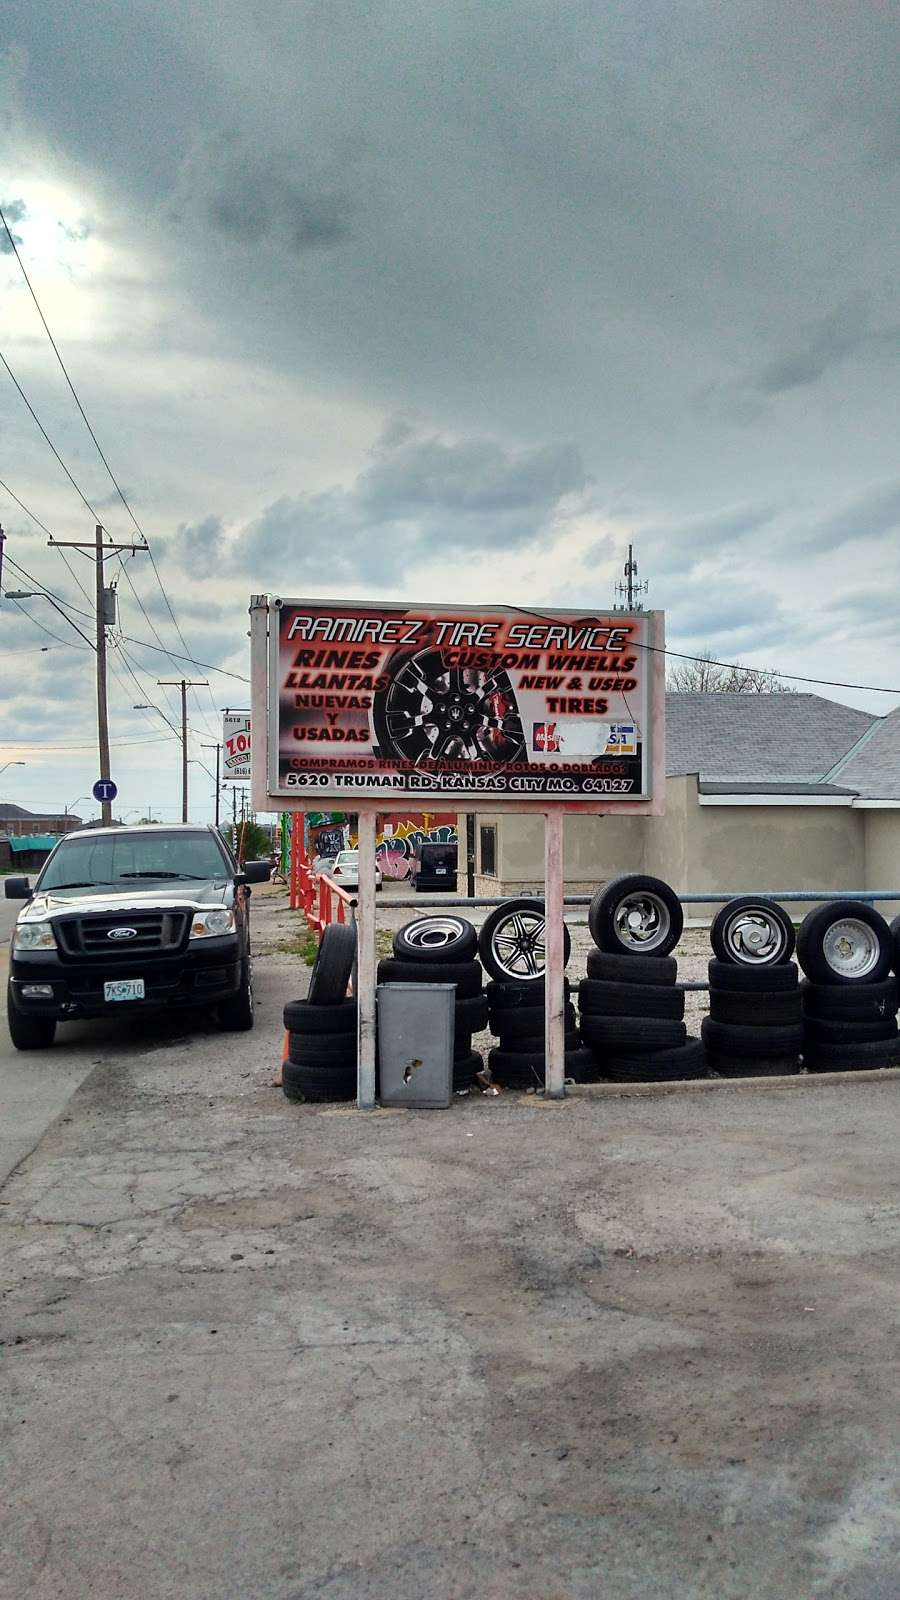 Auto Servivio Vulcano Ramirez Tire Service - car repair  | Photo 1 of 1 | Address: 1444 Lawndale Ave, Kansas City, MO 64127, USA